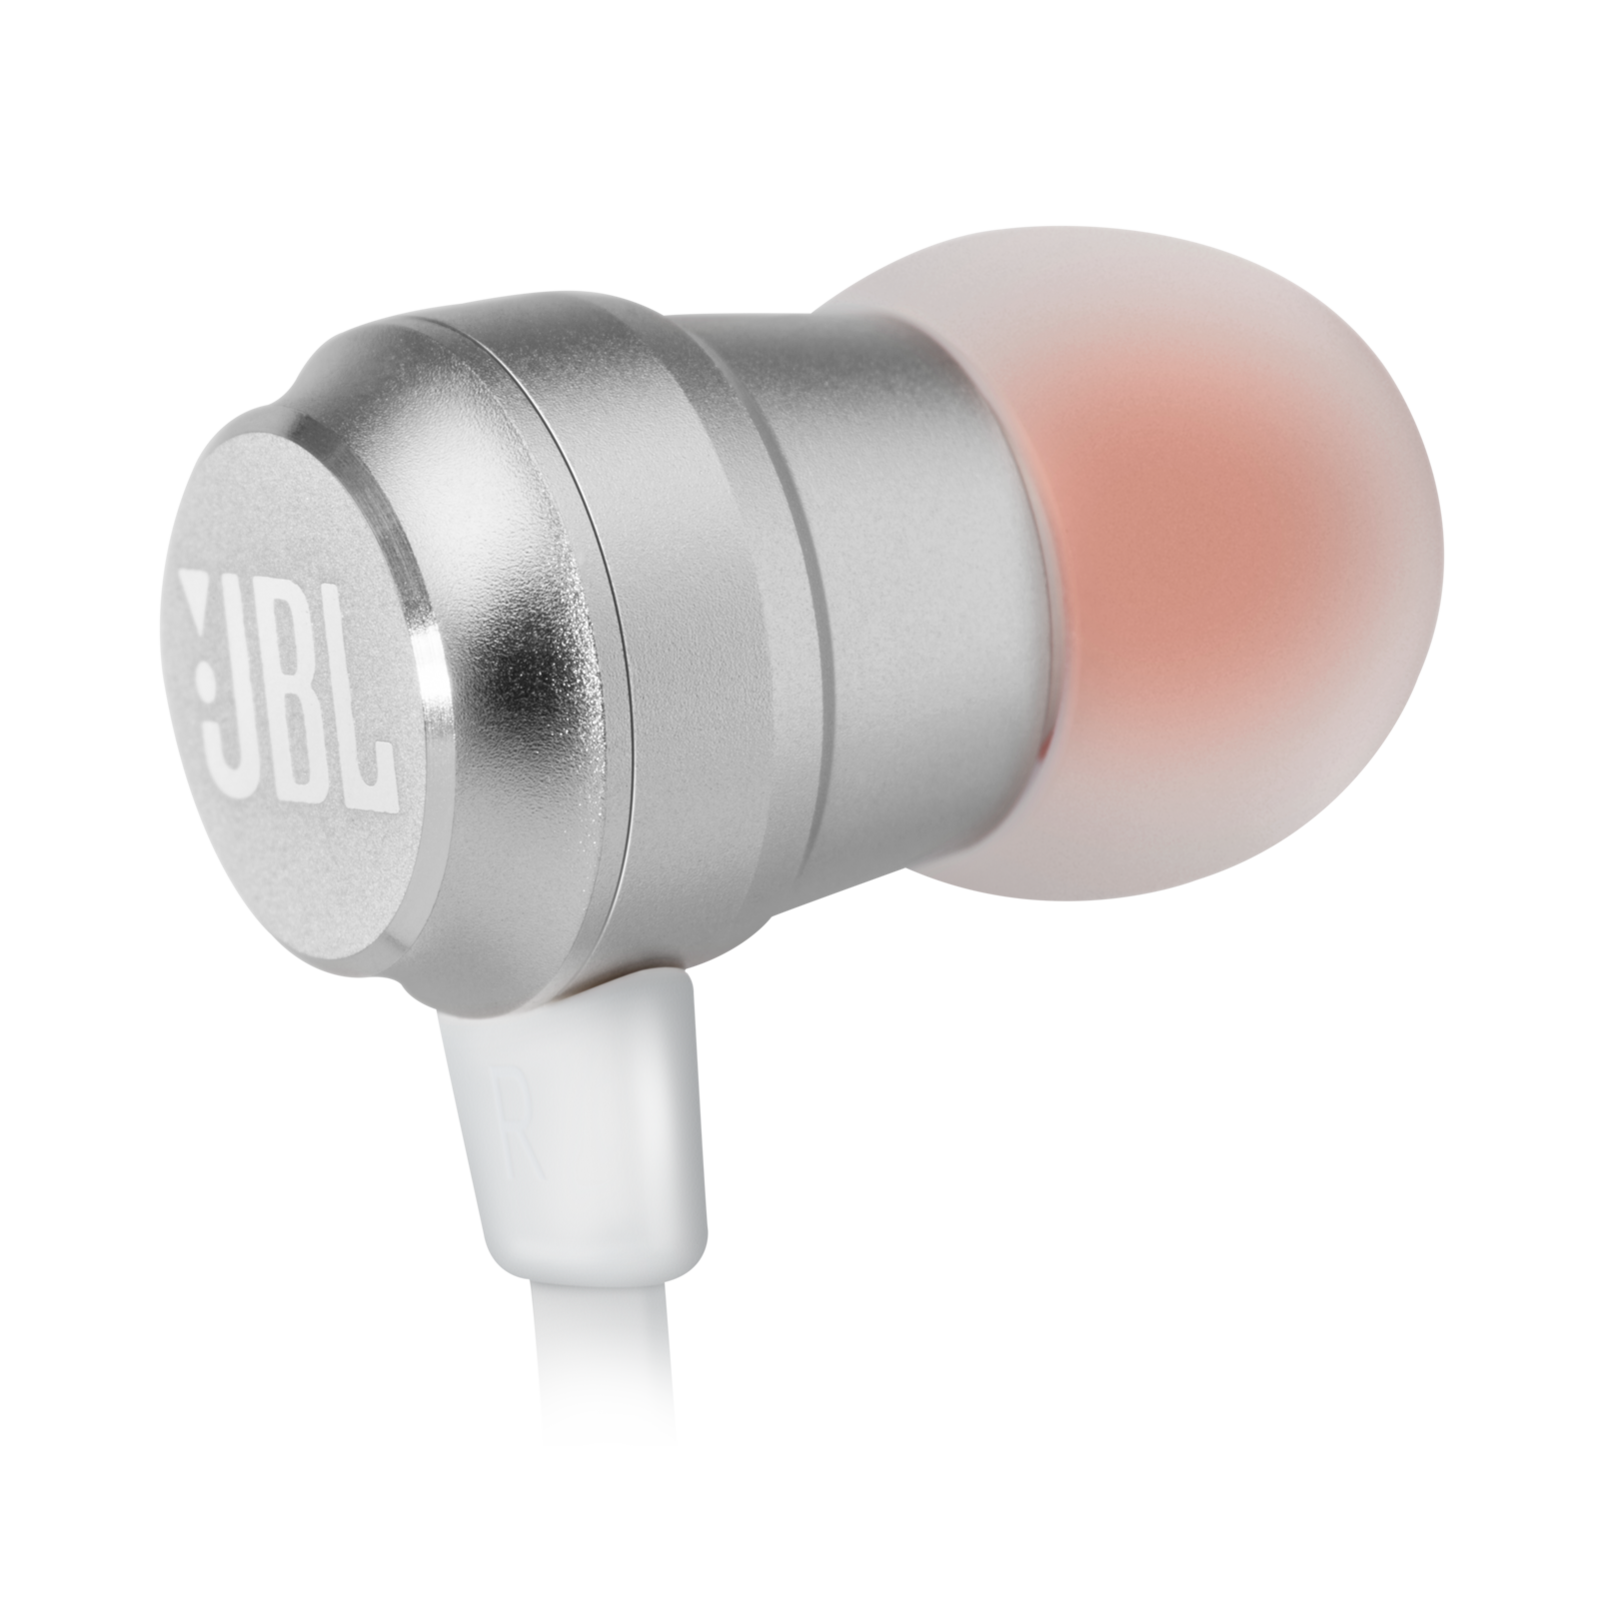 JBL T280A